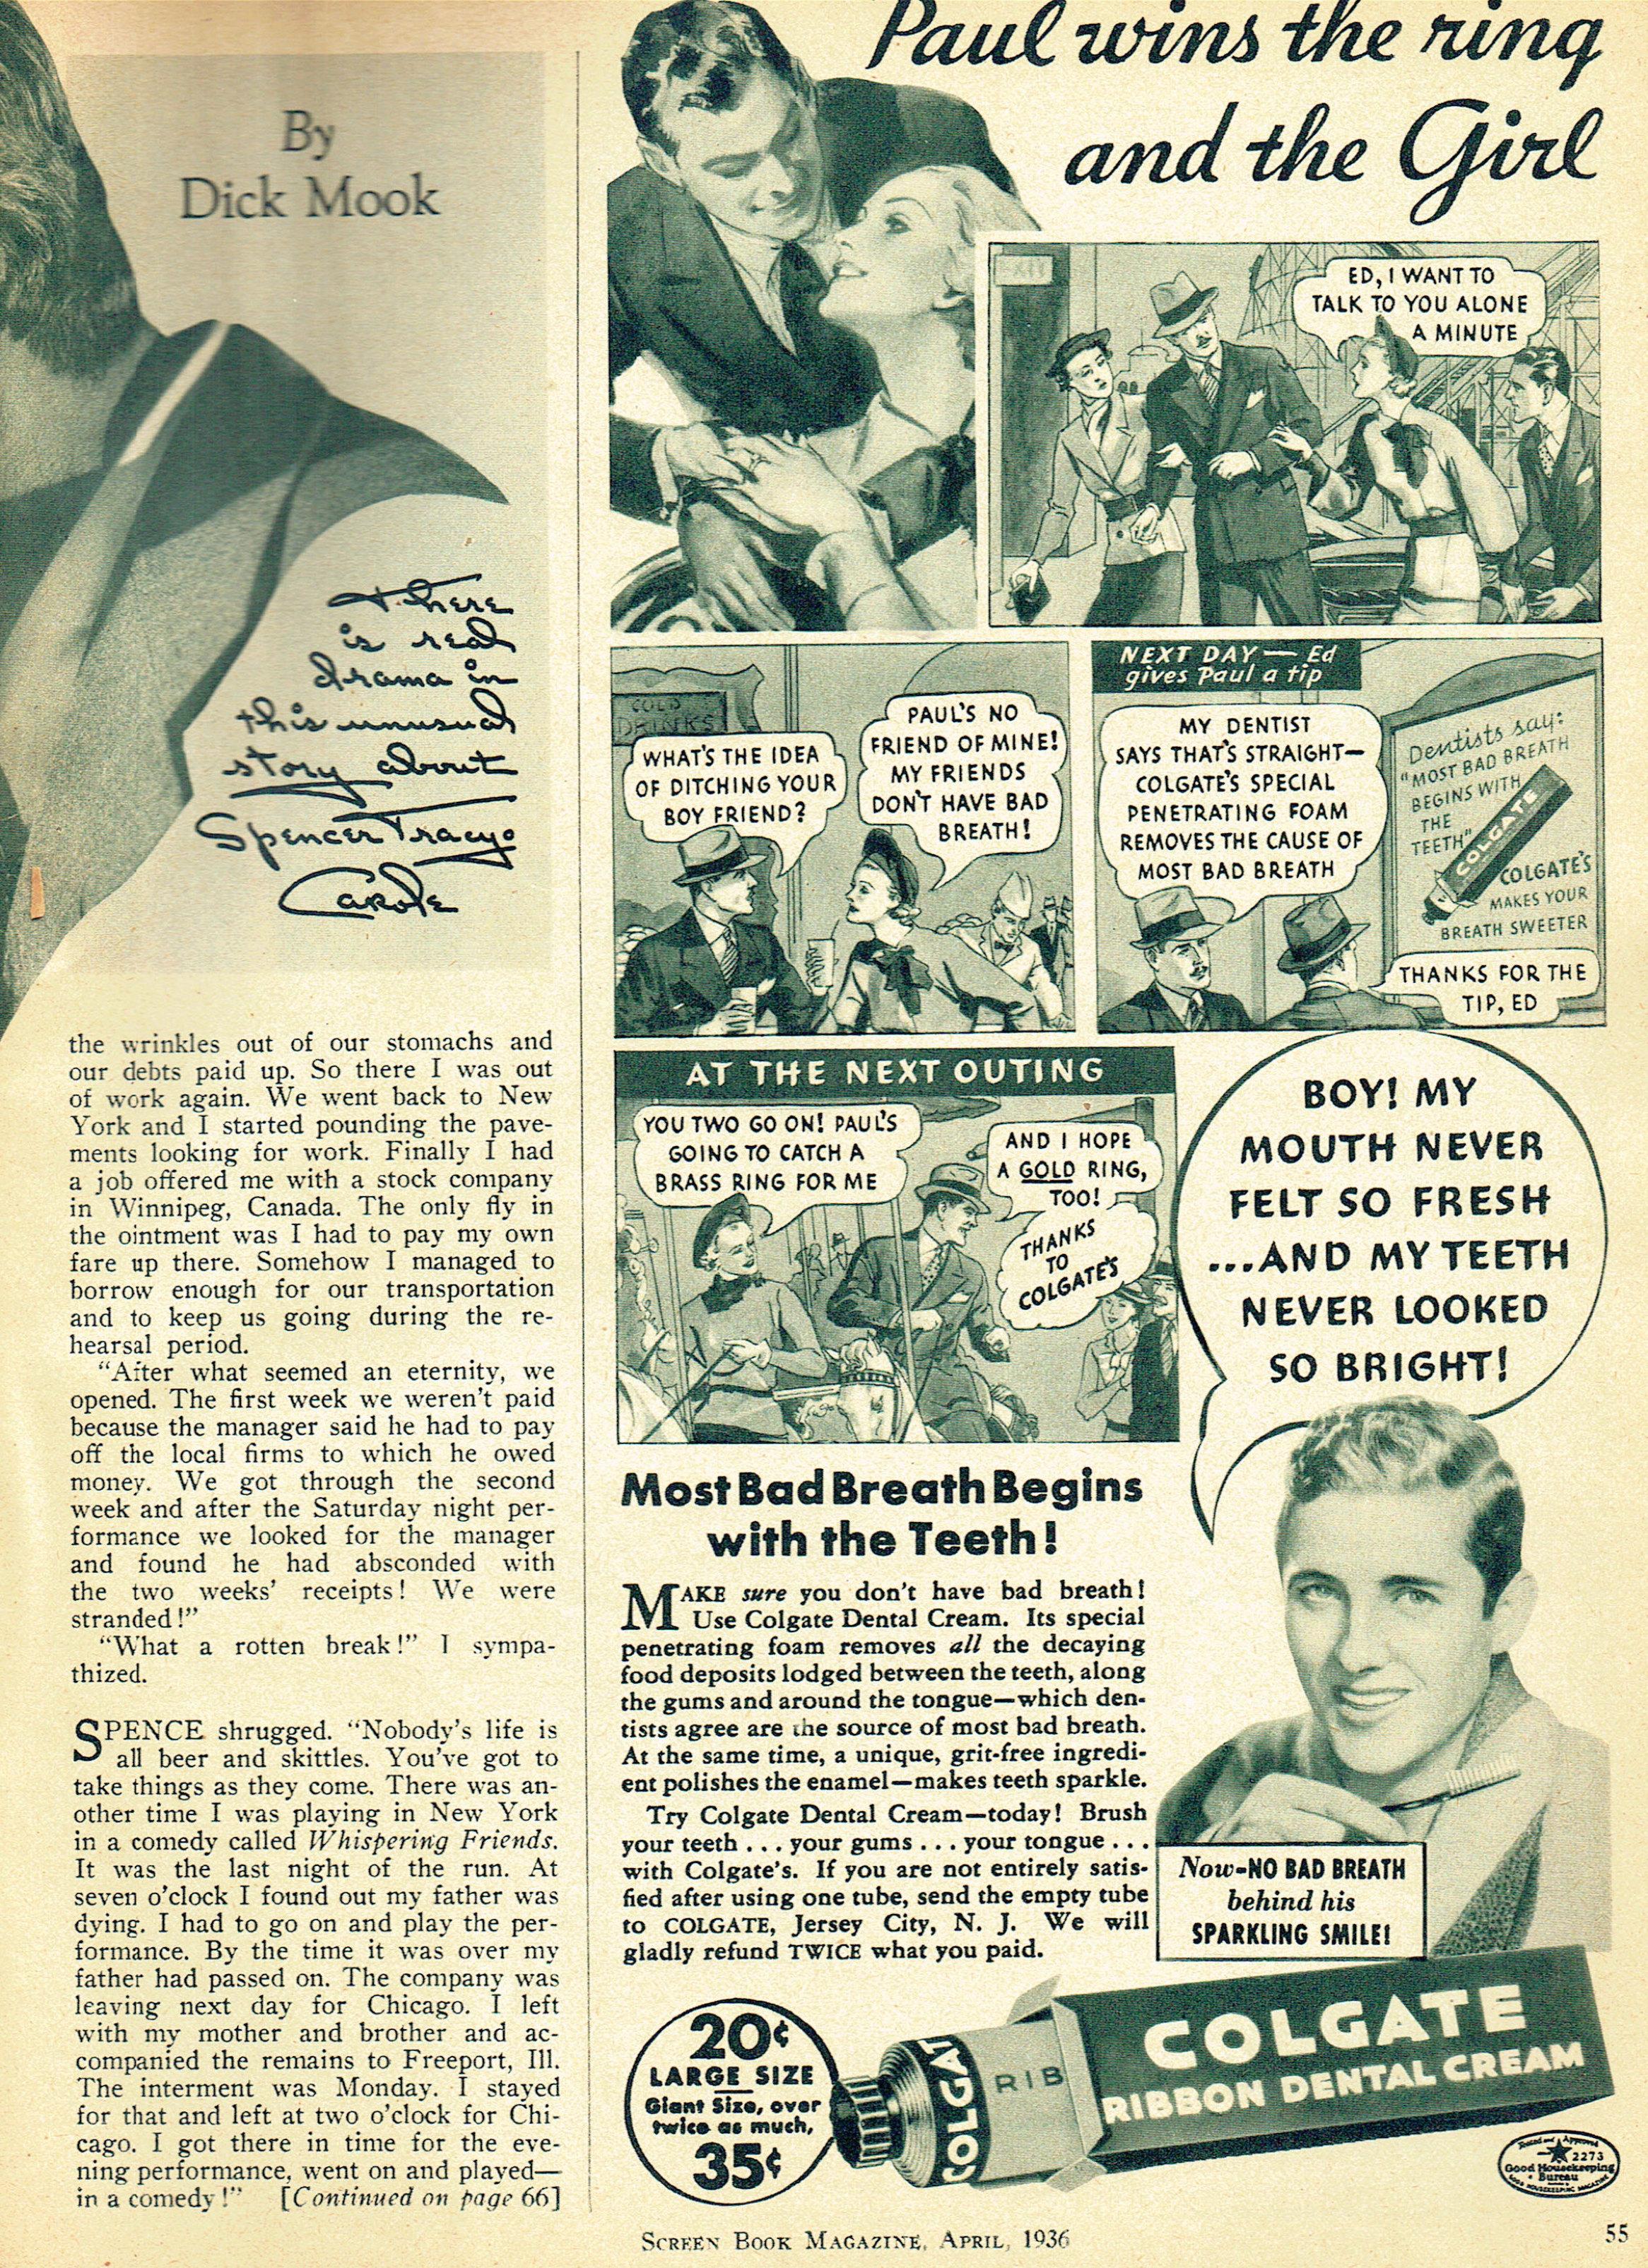 carole lombard screen book april 1936ua